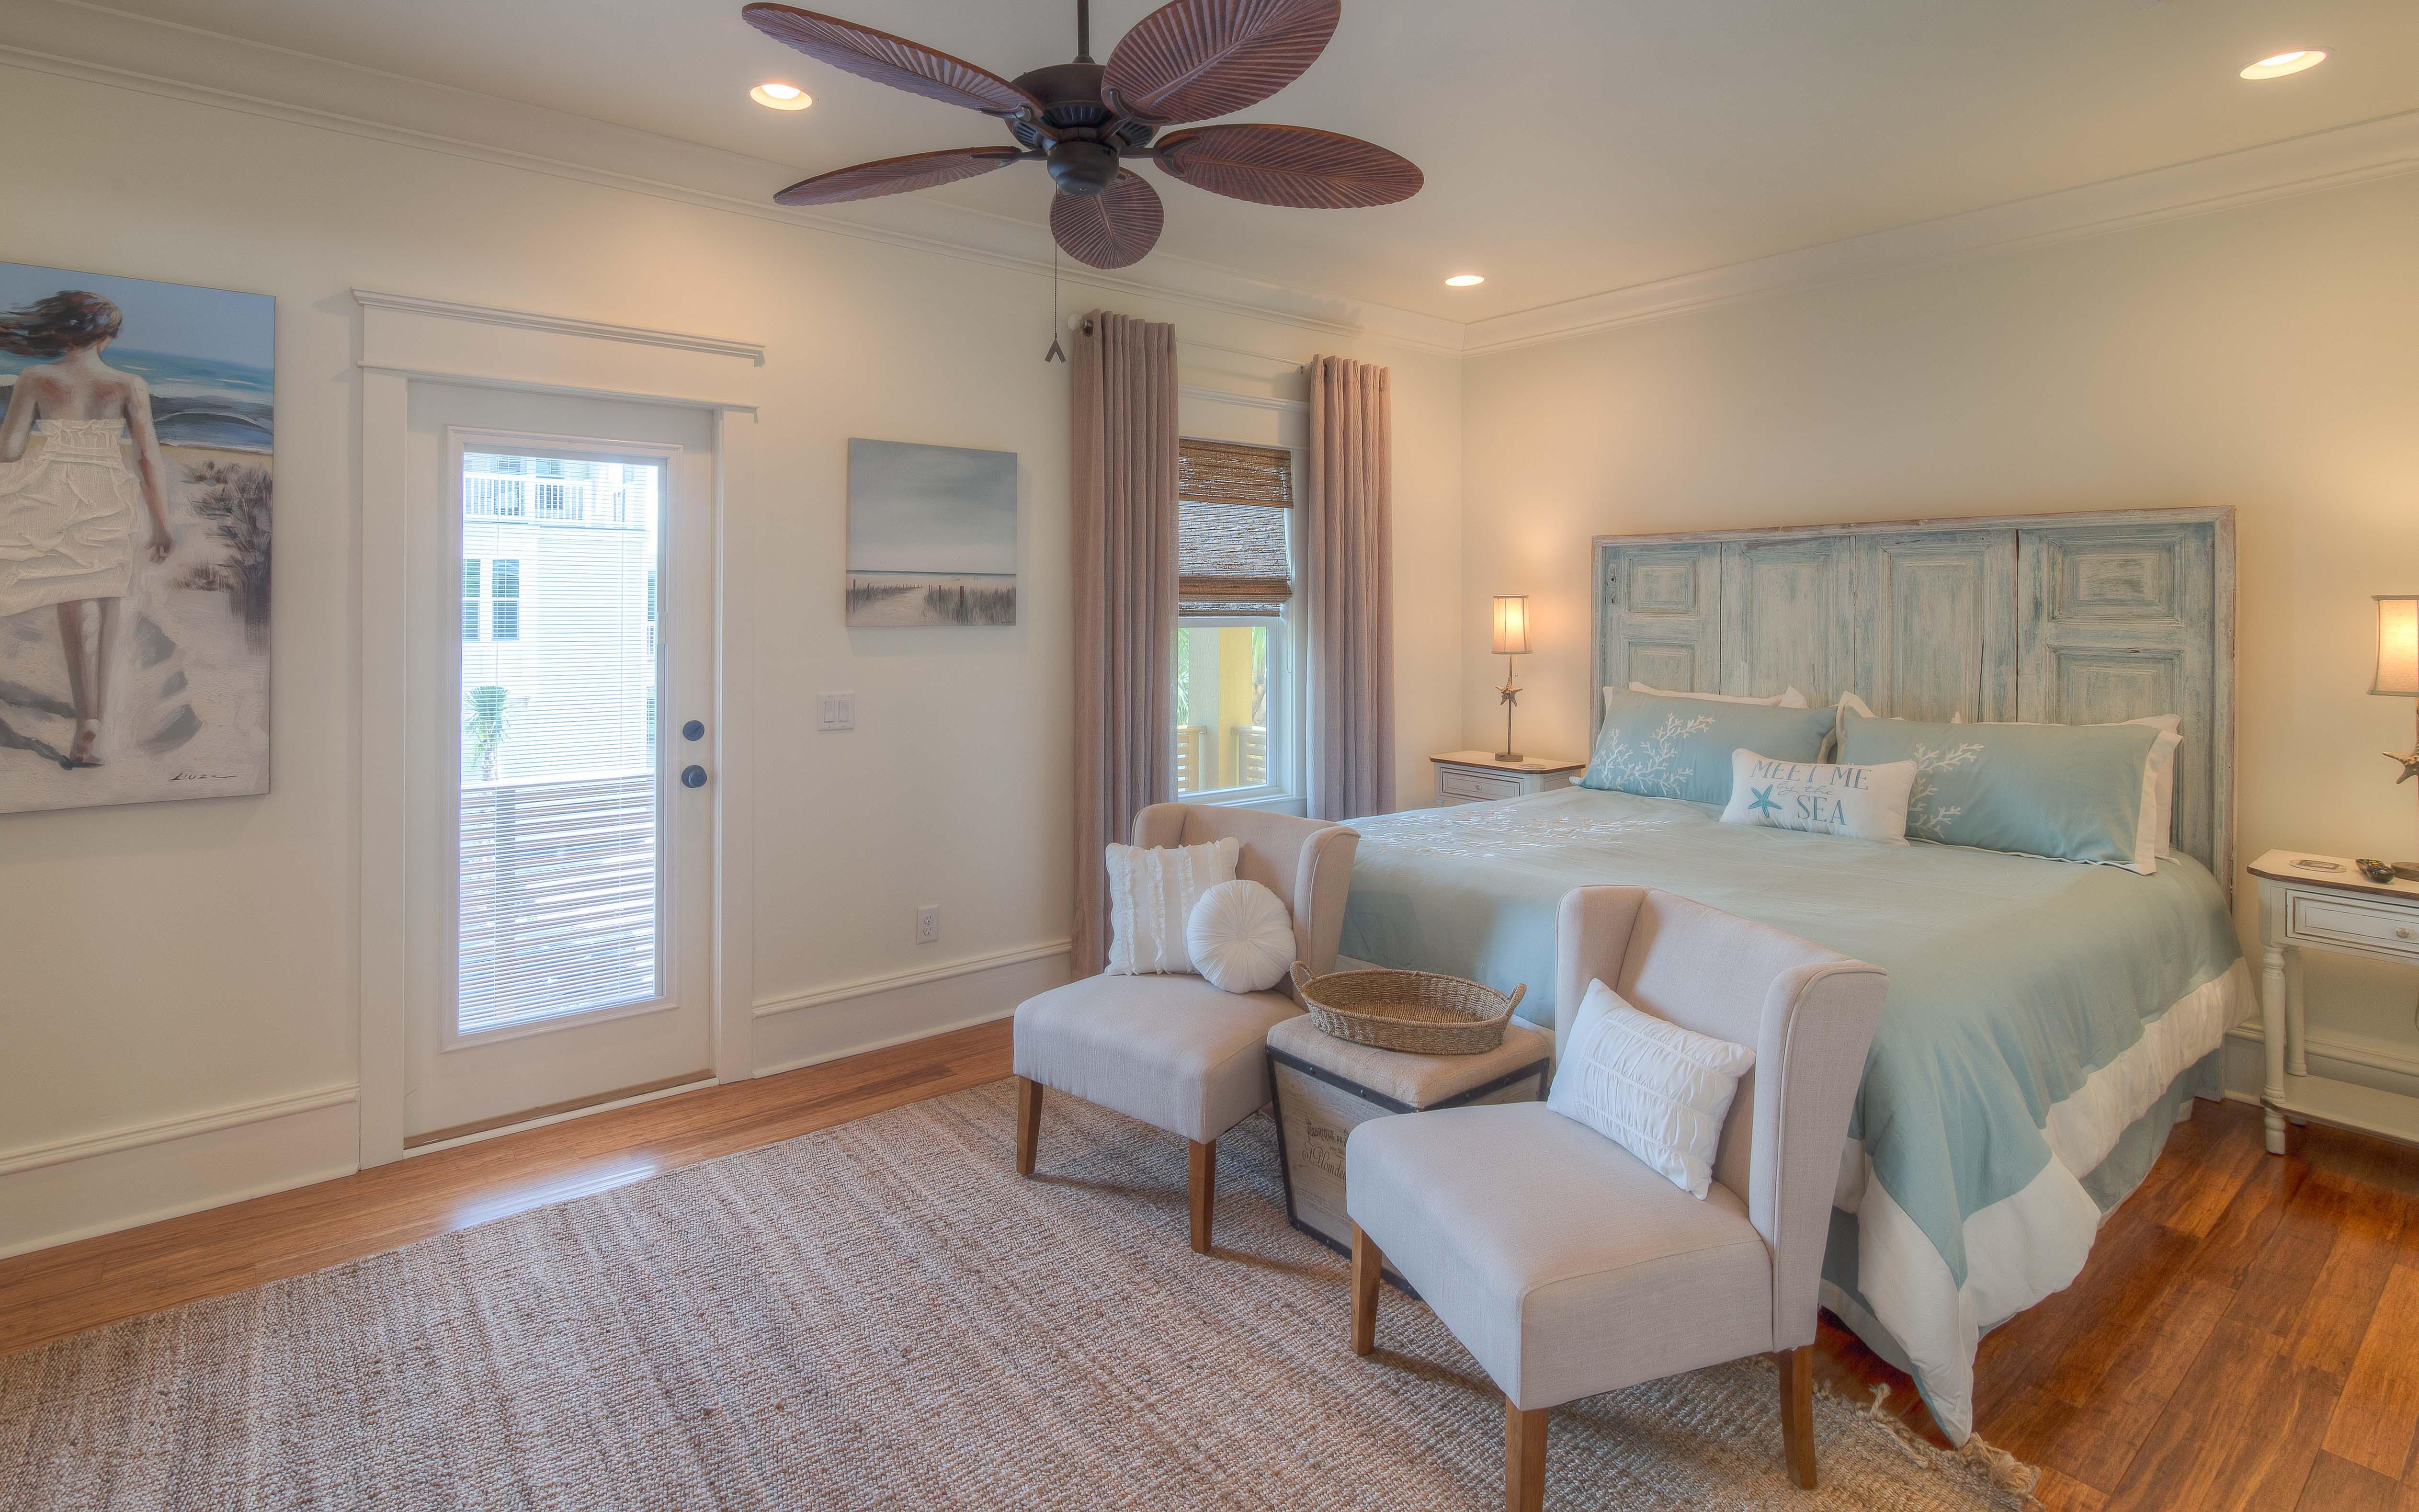 Newly Remodeled Seacrest Resort Home Backs Up To